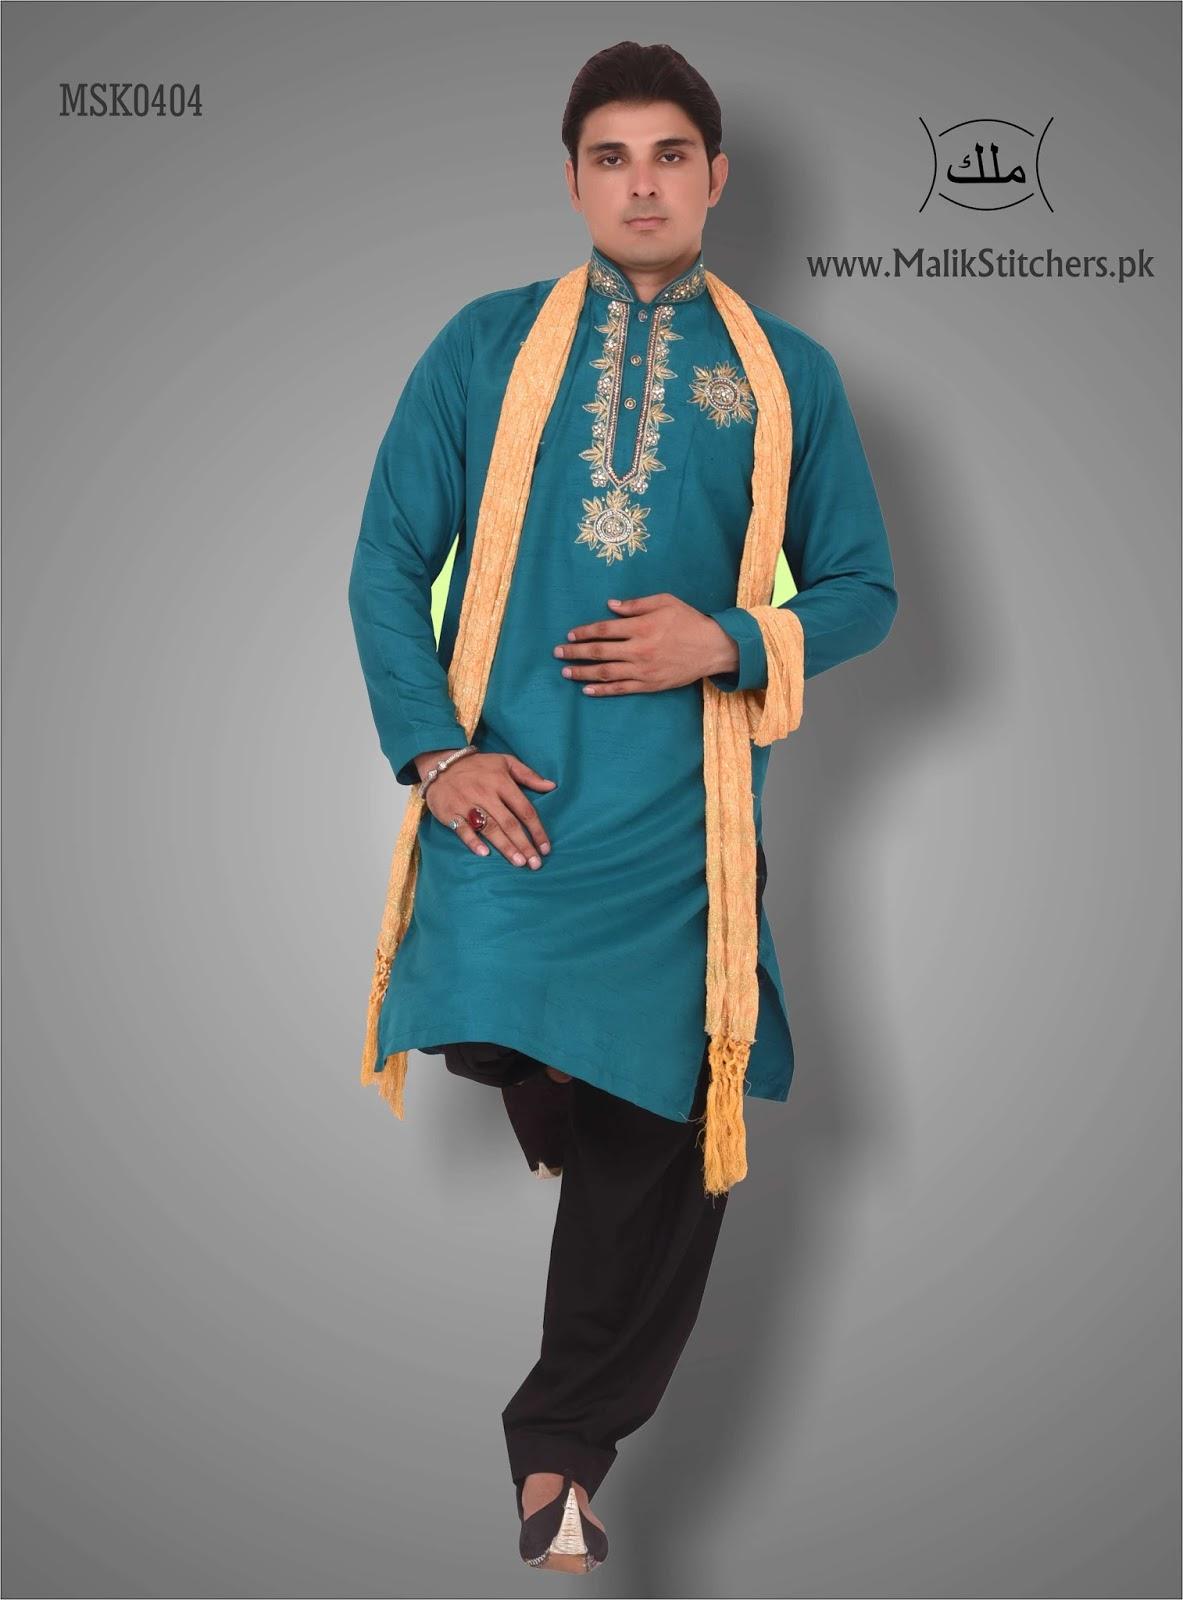 Malik Stitchers ملك : MSK0404 Wholesale dealer of gents kurta in ...